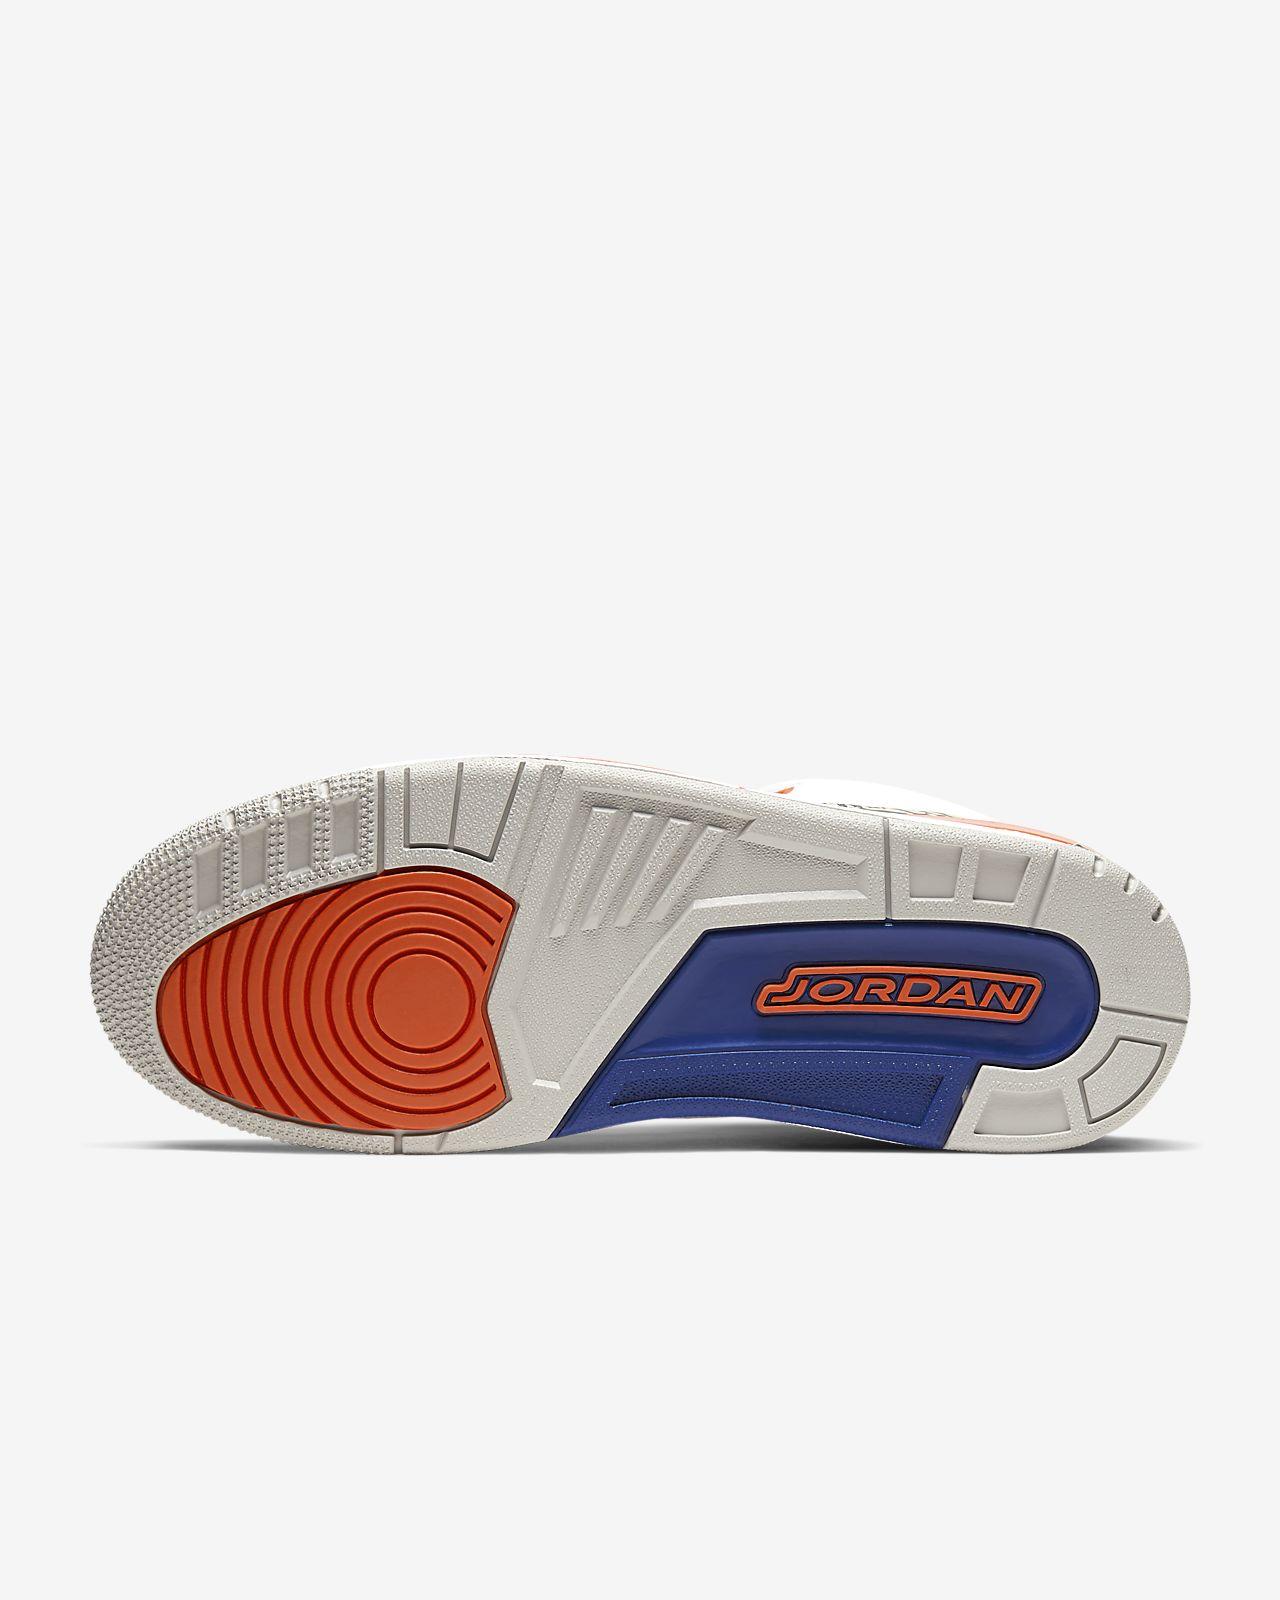 check out 1df5b 2cb69 Air Jordan 3 Retro Men's Shoe